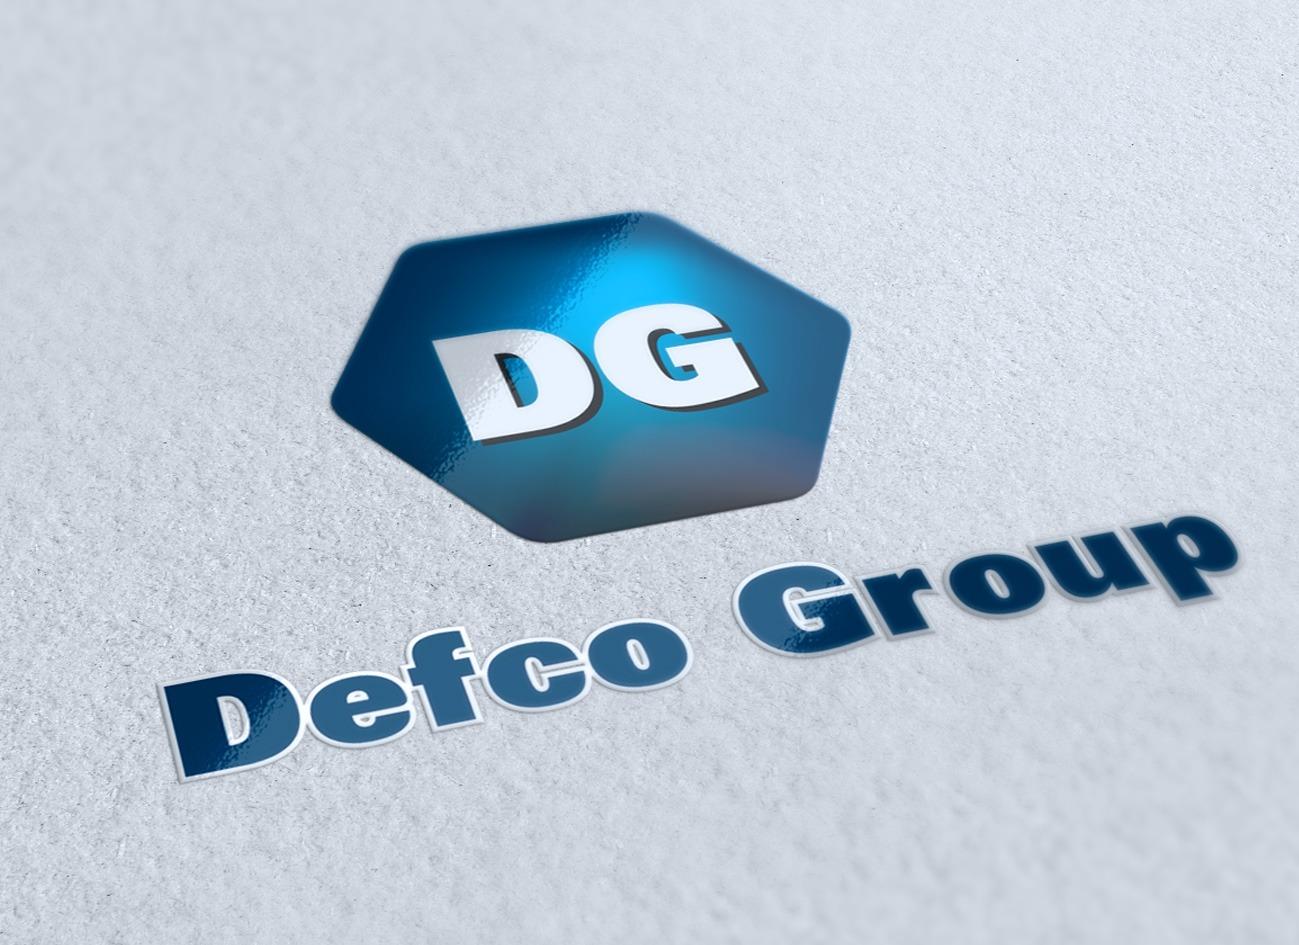 Defco Group logo